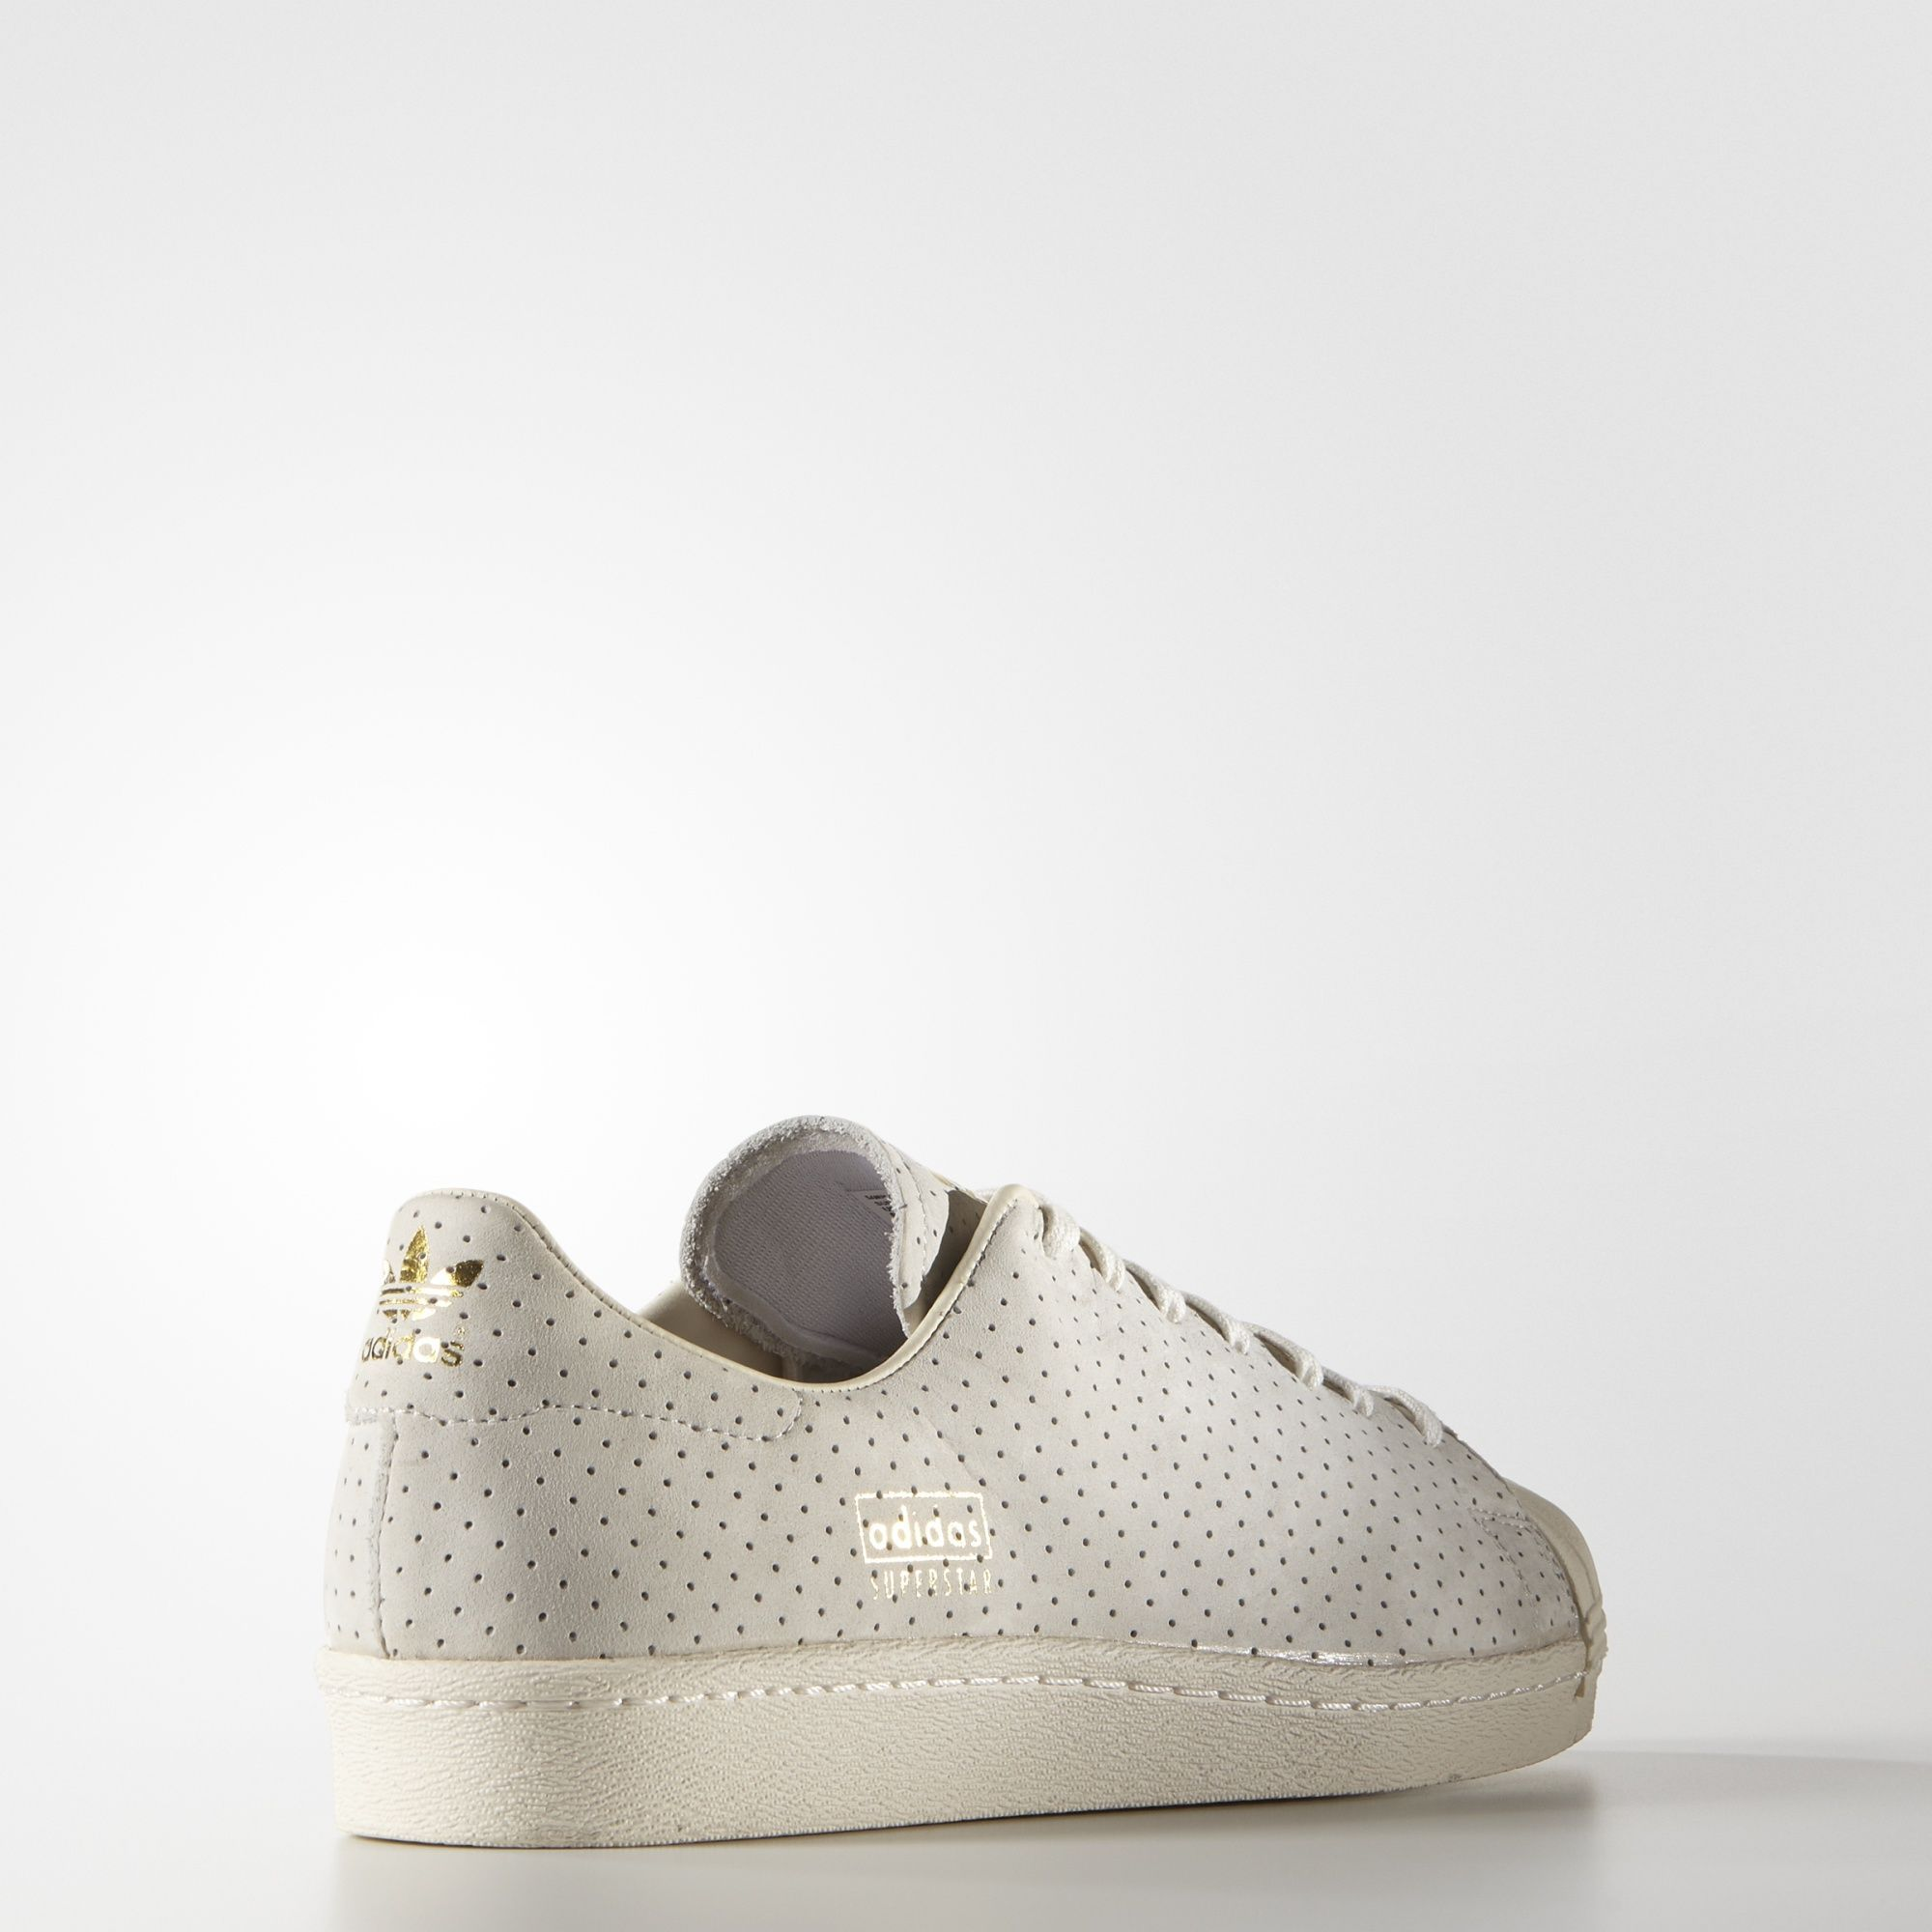 Adidas Superstar Degli Anni Ottanta Adidas Pulito Schuh Schuhe Pinterest Adidas Ottanta 00ed88